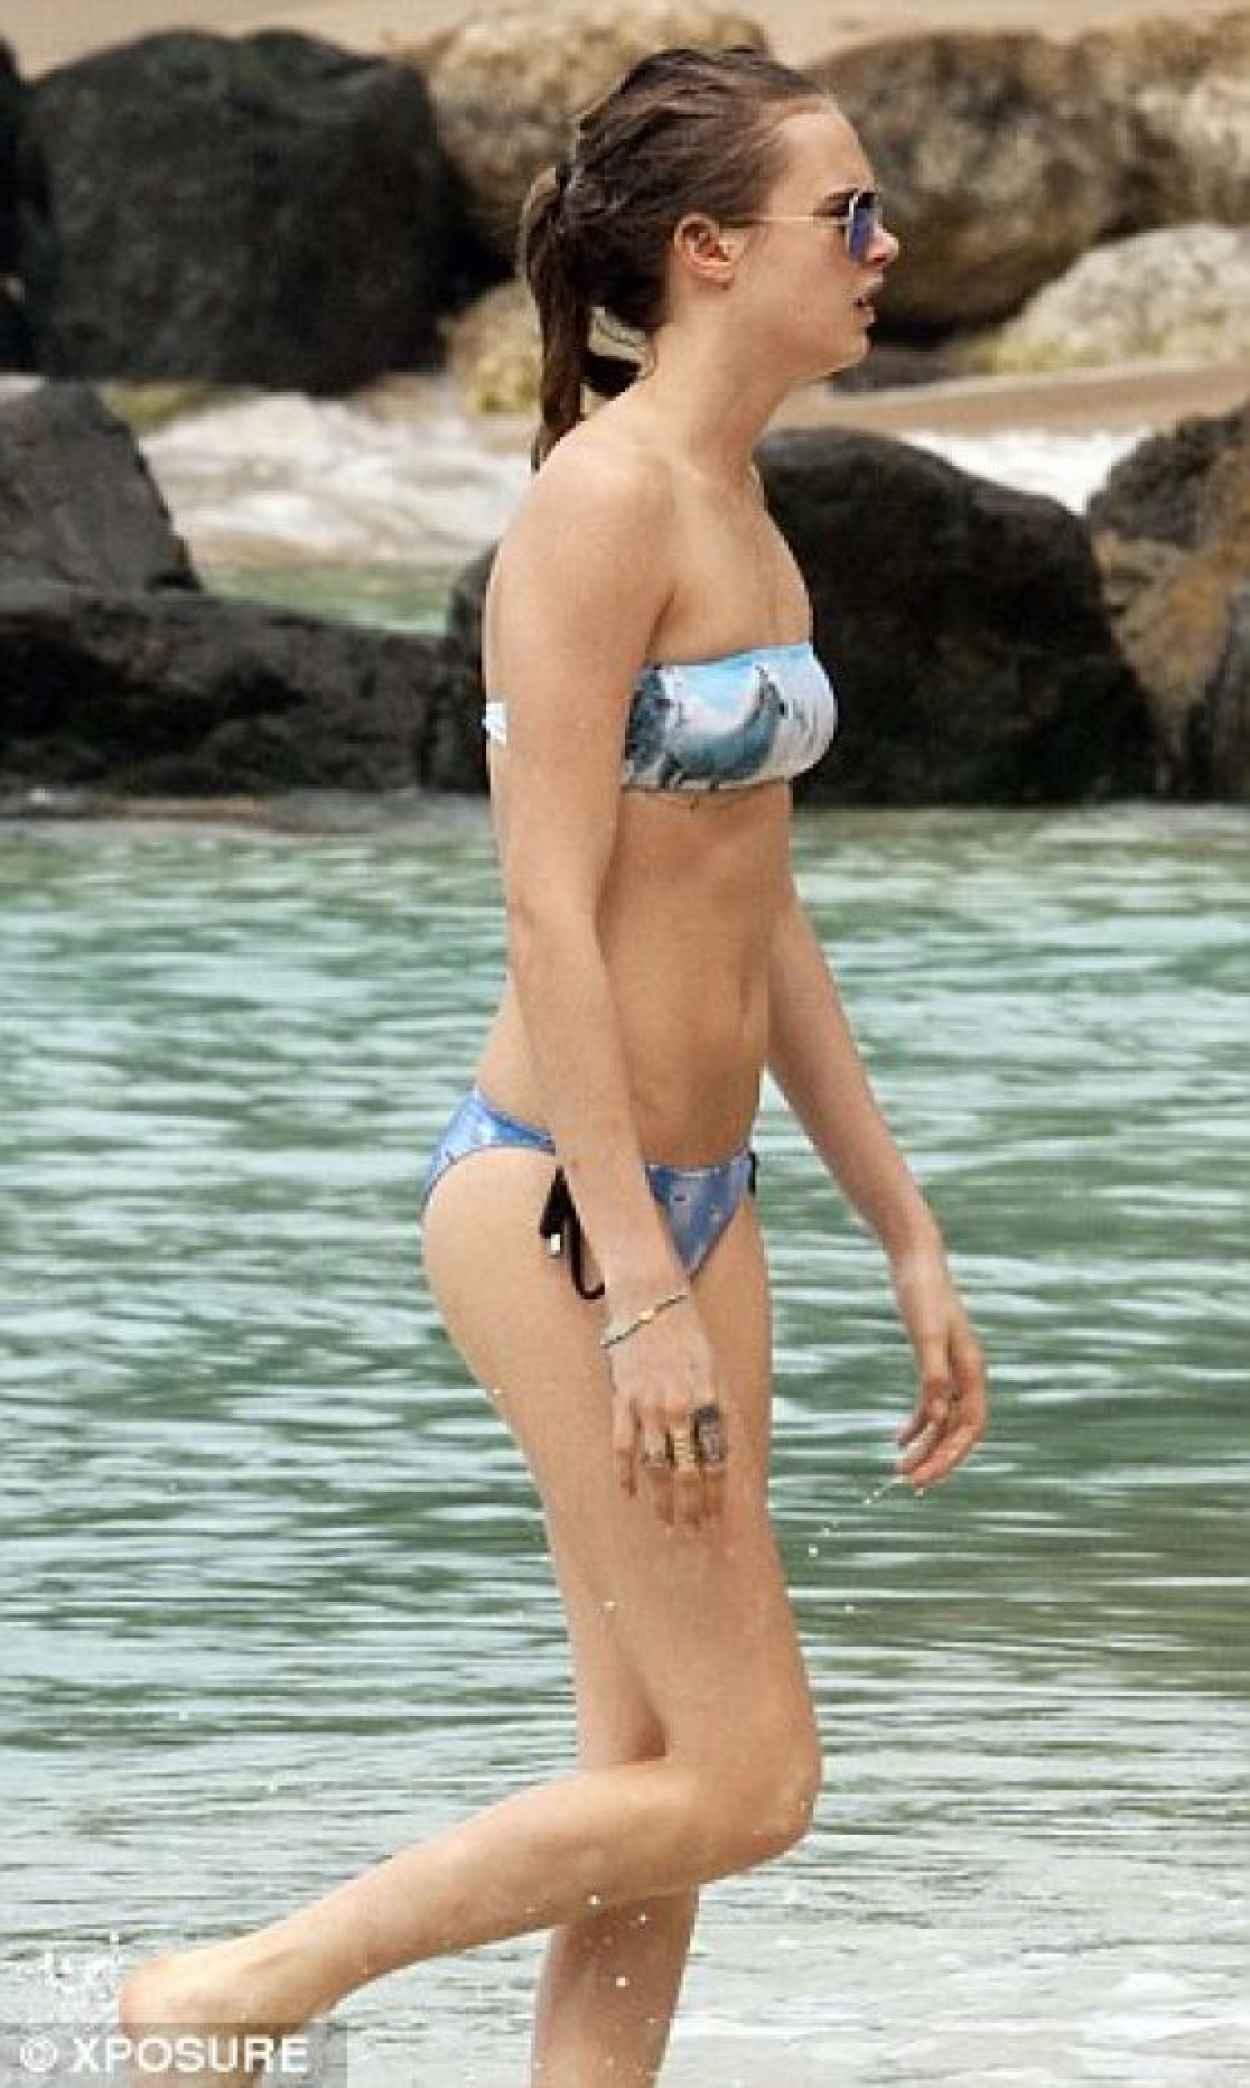 Cara Delevingne in a Bikini in Barbados - December 25, 2015 - Part 1-1